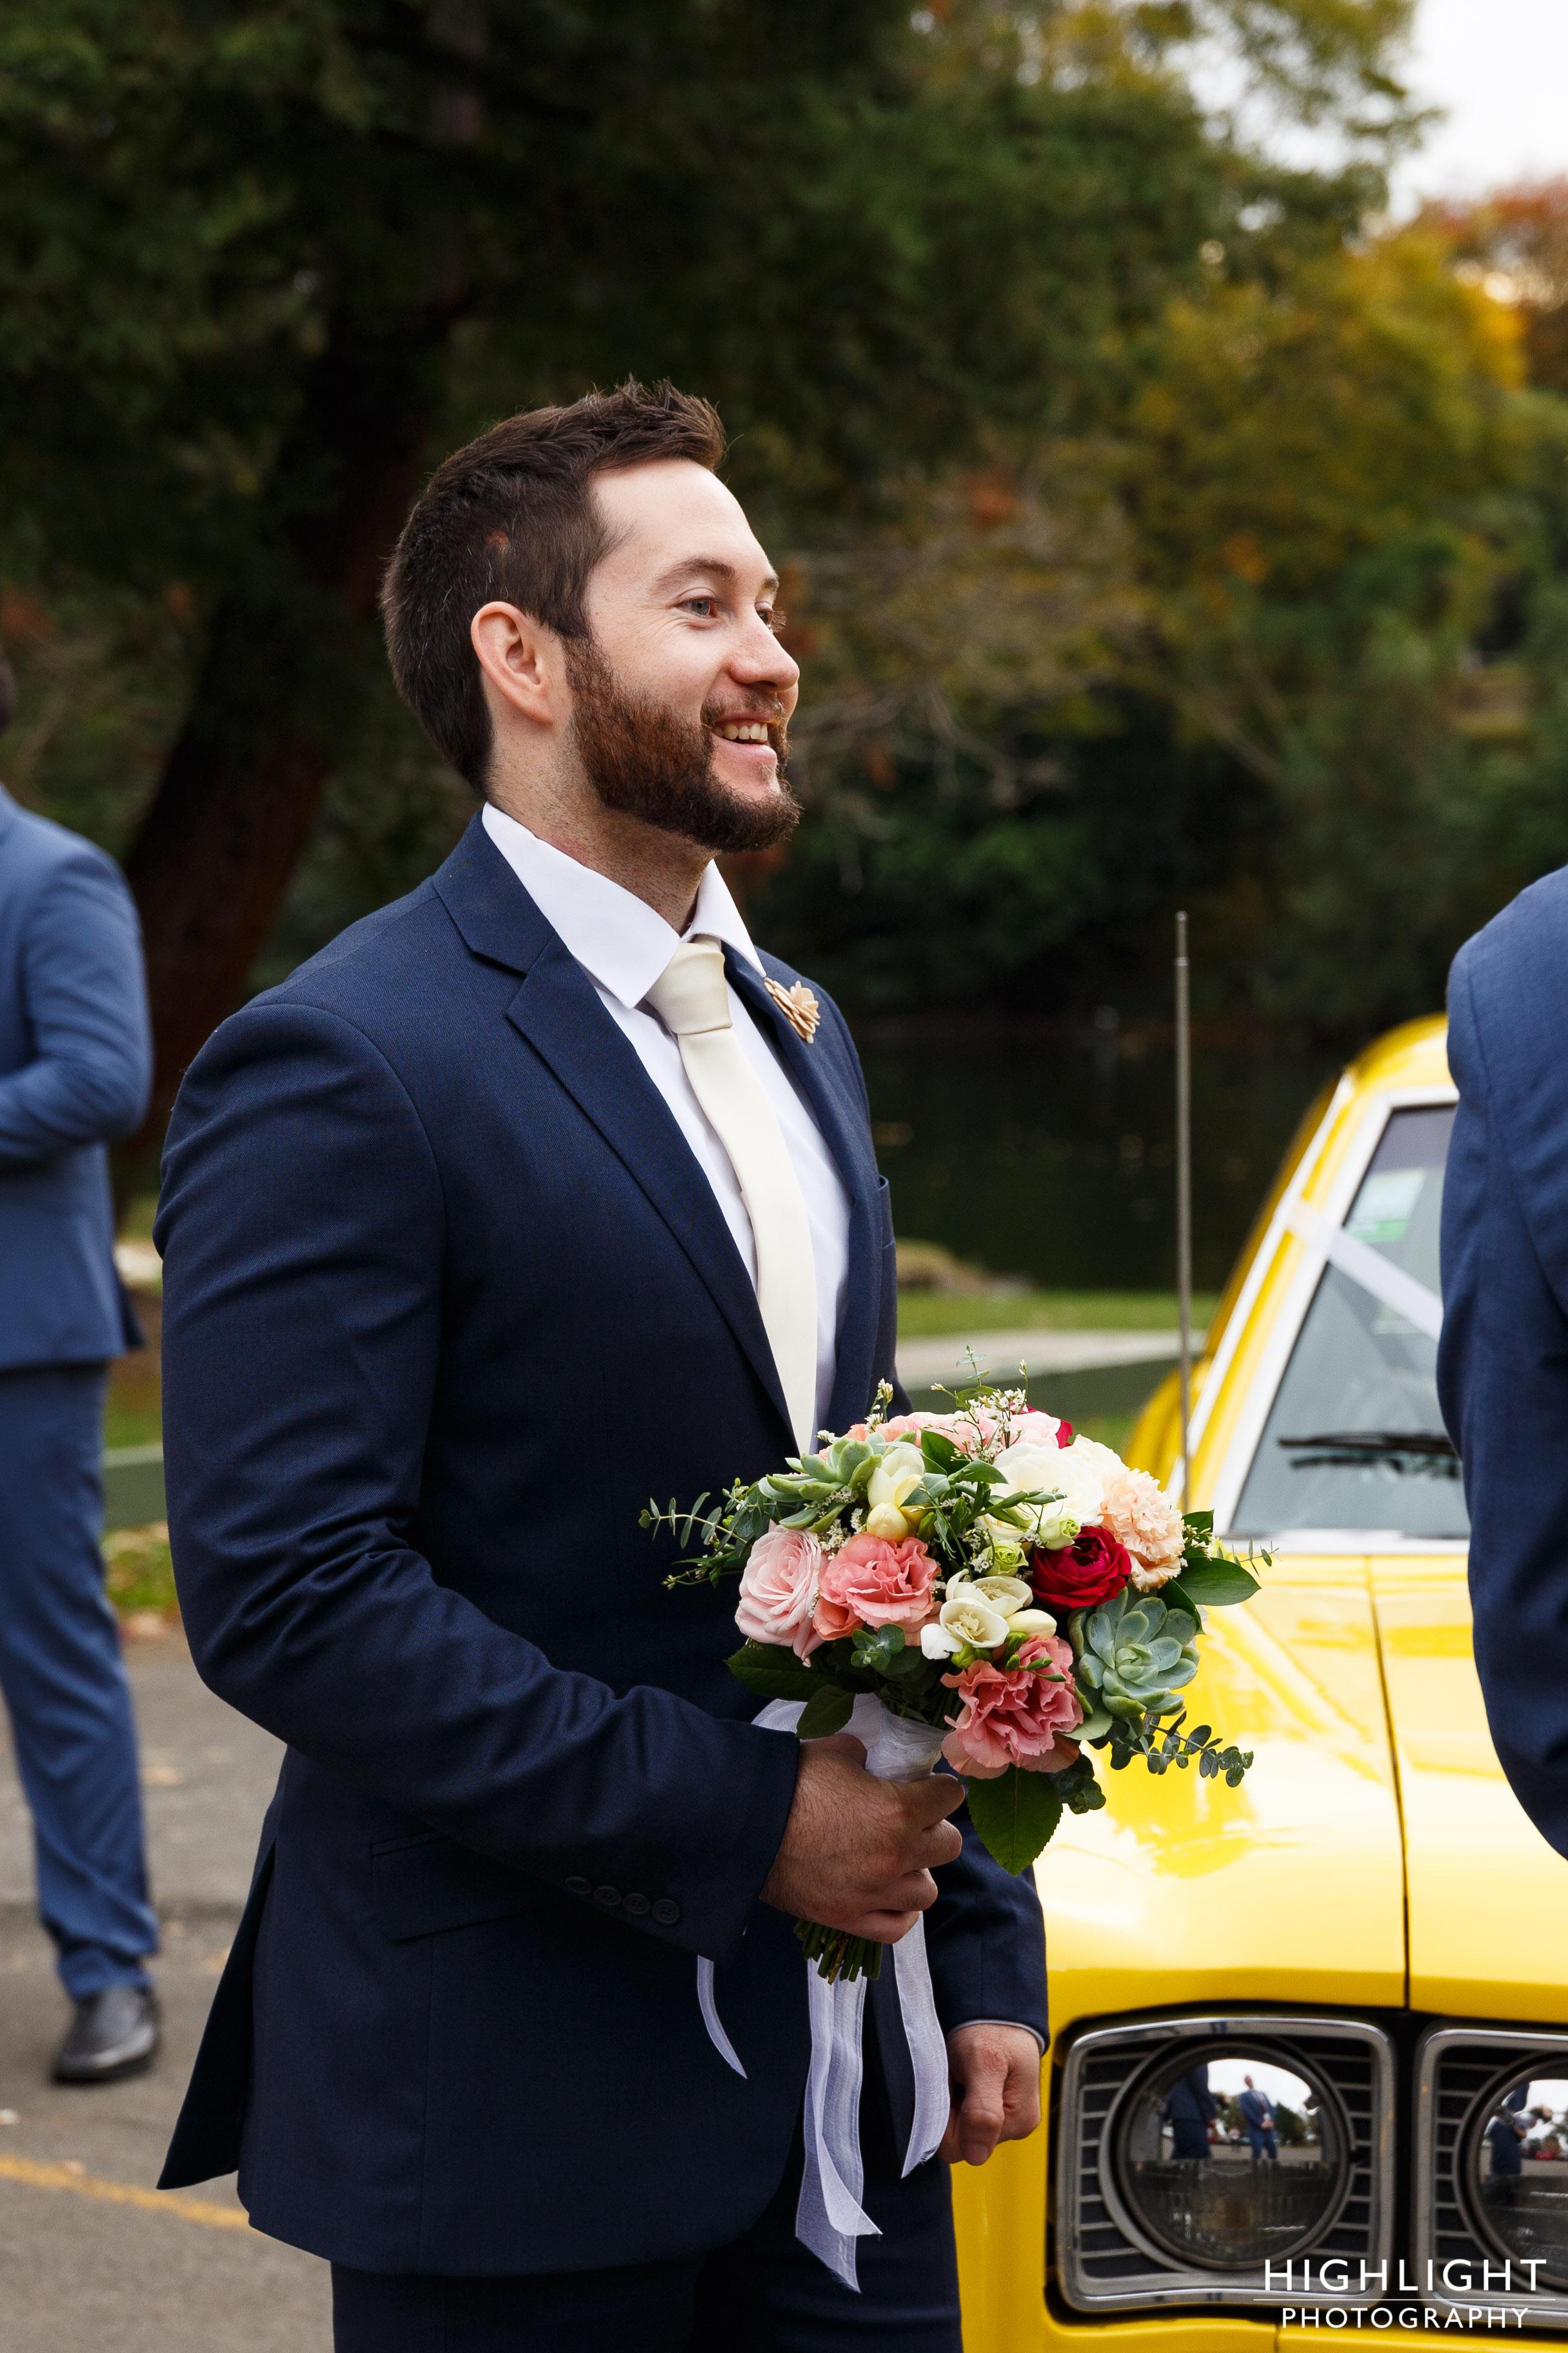 highlight-wedding-photography-palmerston-north-new-zealand-manawatu-chalet-64.jpg